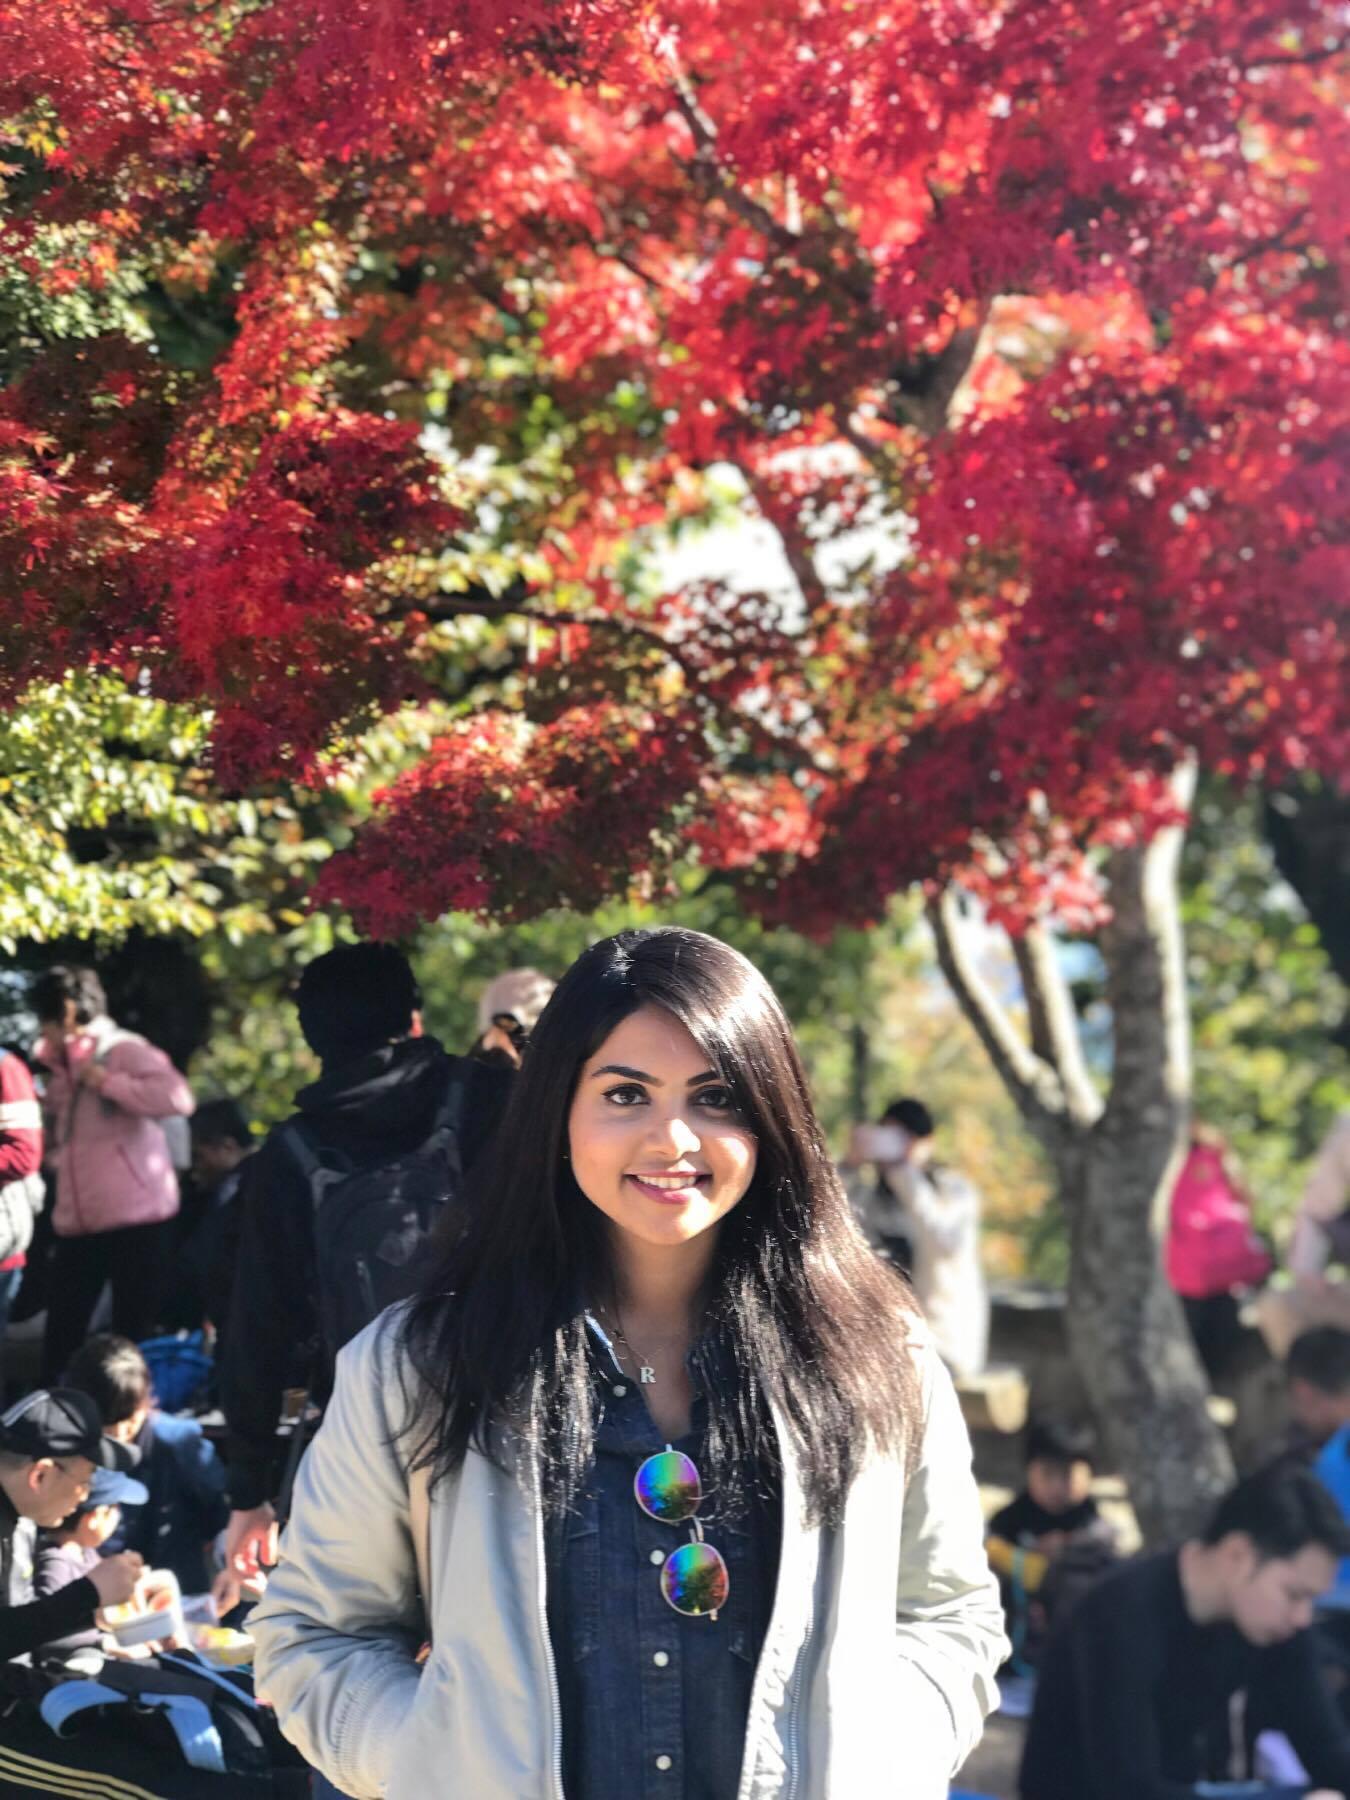 Autumn Foliage from Mt. Takao